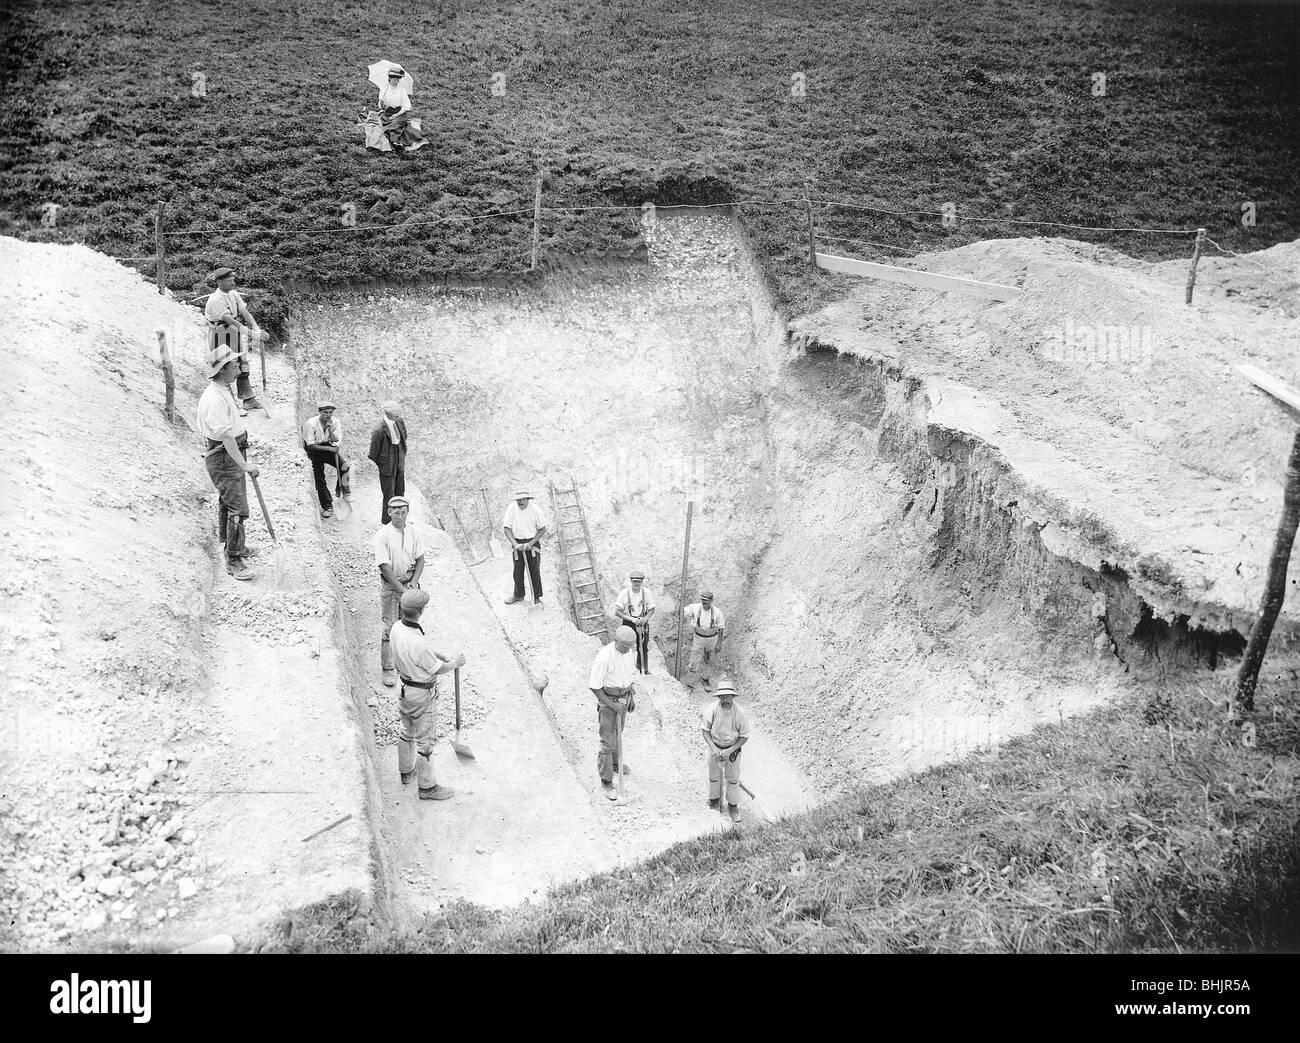 Excavation at Avebury, Wiltshire, 1909. Artist: Harold St George Gray - Stock Image